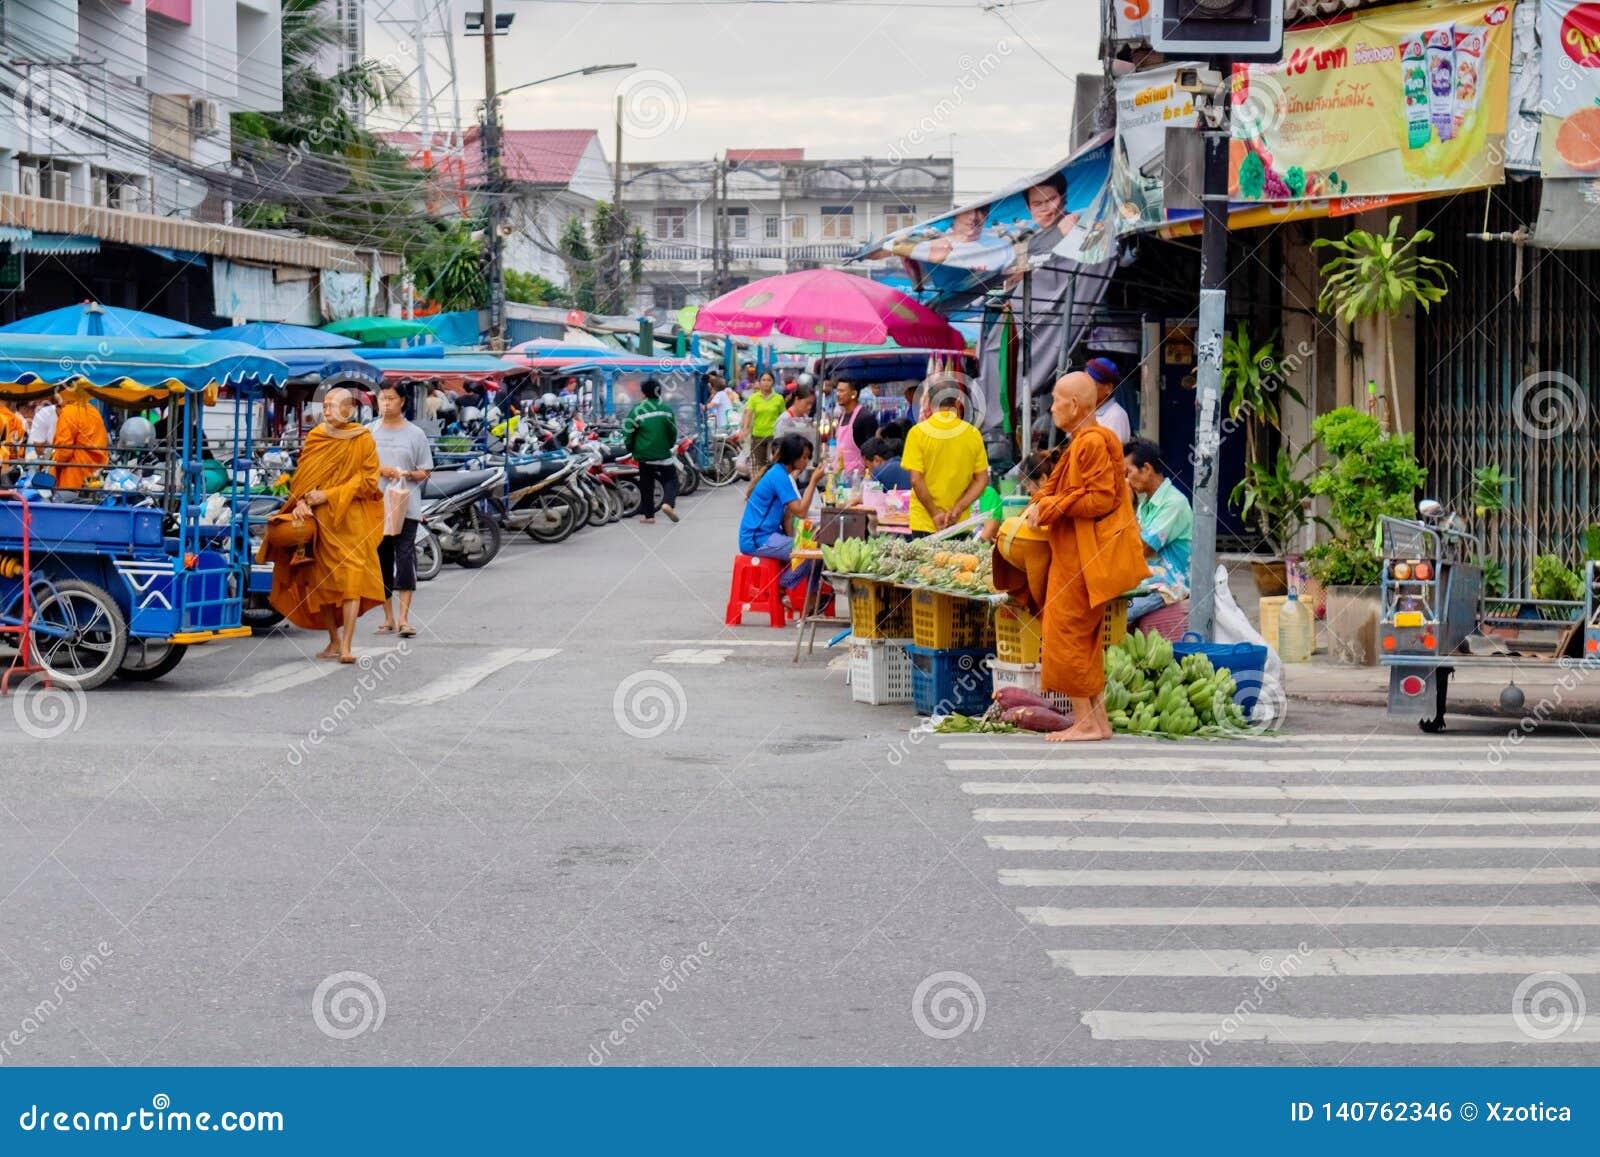 Thai people at Prachuabkirikhan province showing its lifestyle at morning market with many monks walking around. Prachuabkirikhan